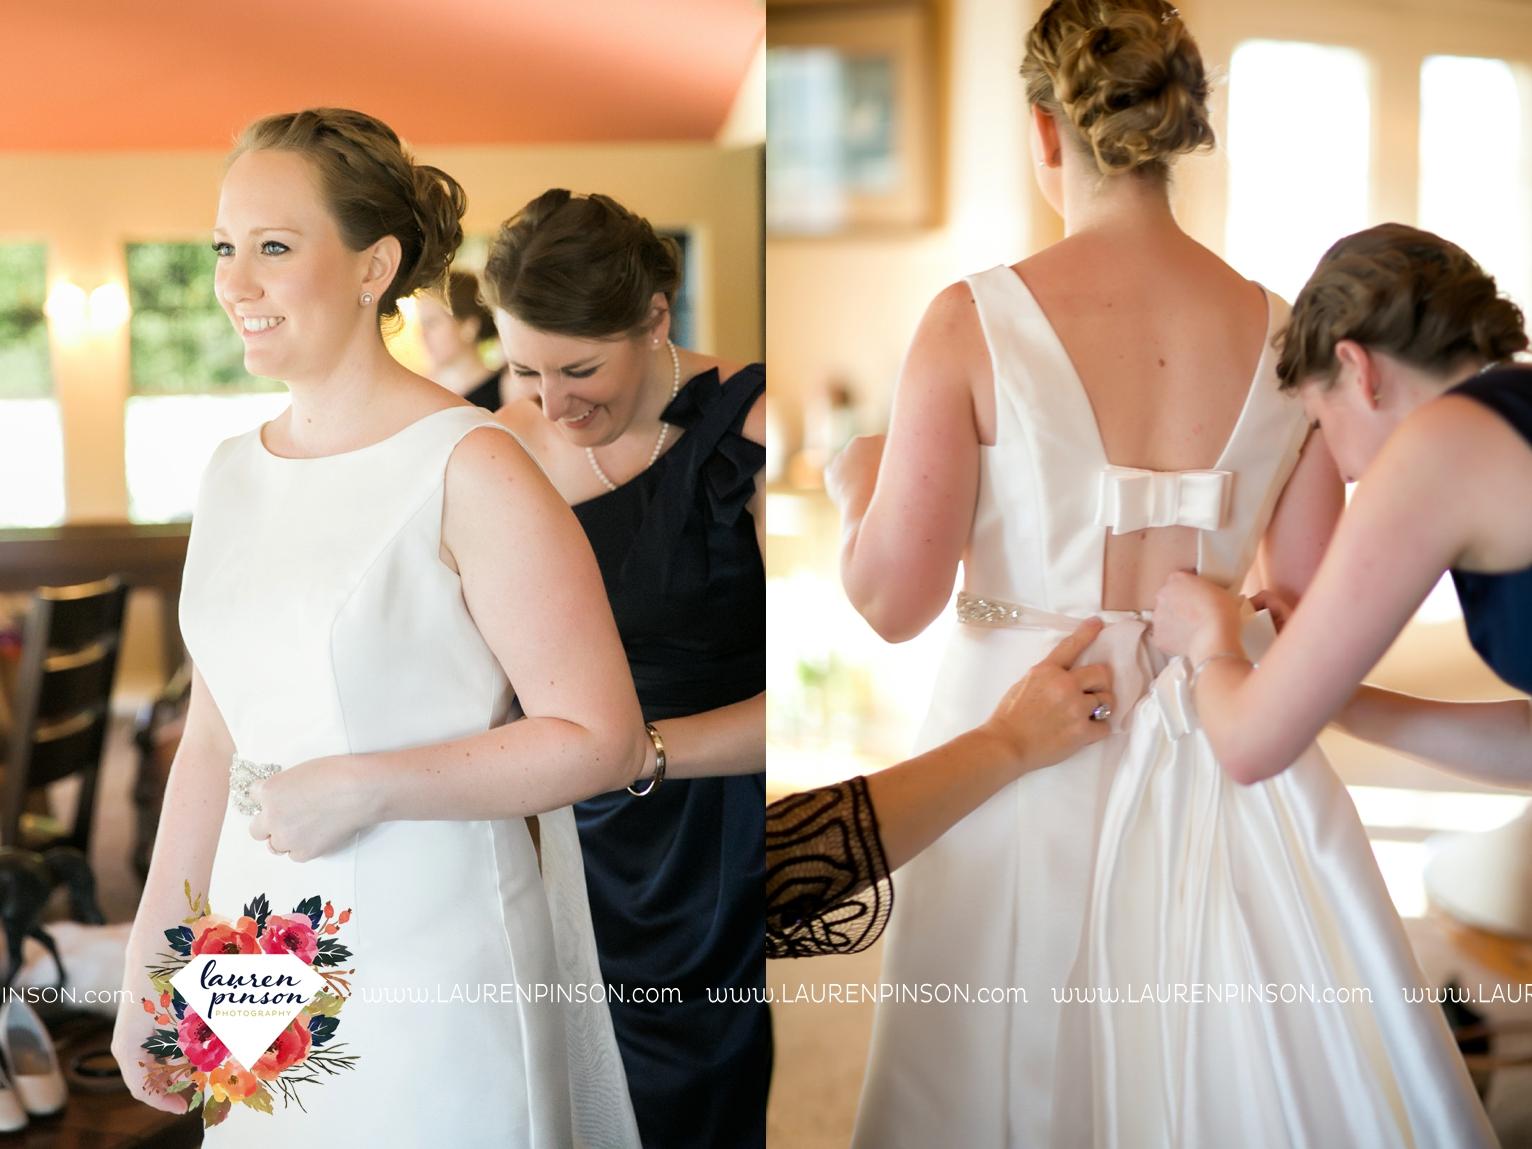 bells-texas-wedding-photography-at-willowood-ranch-chapel-north-texas-wichita-falls-wedding-photographer_1819.jpg